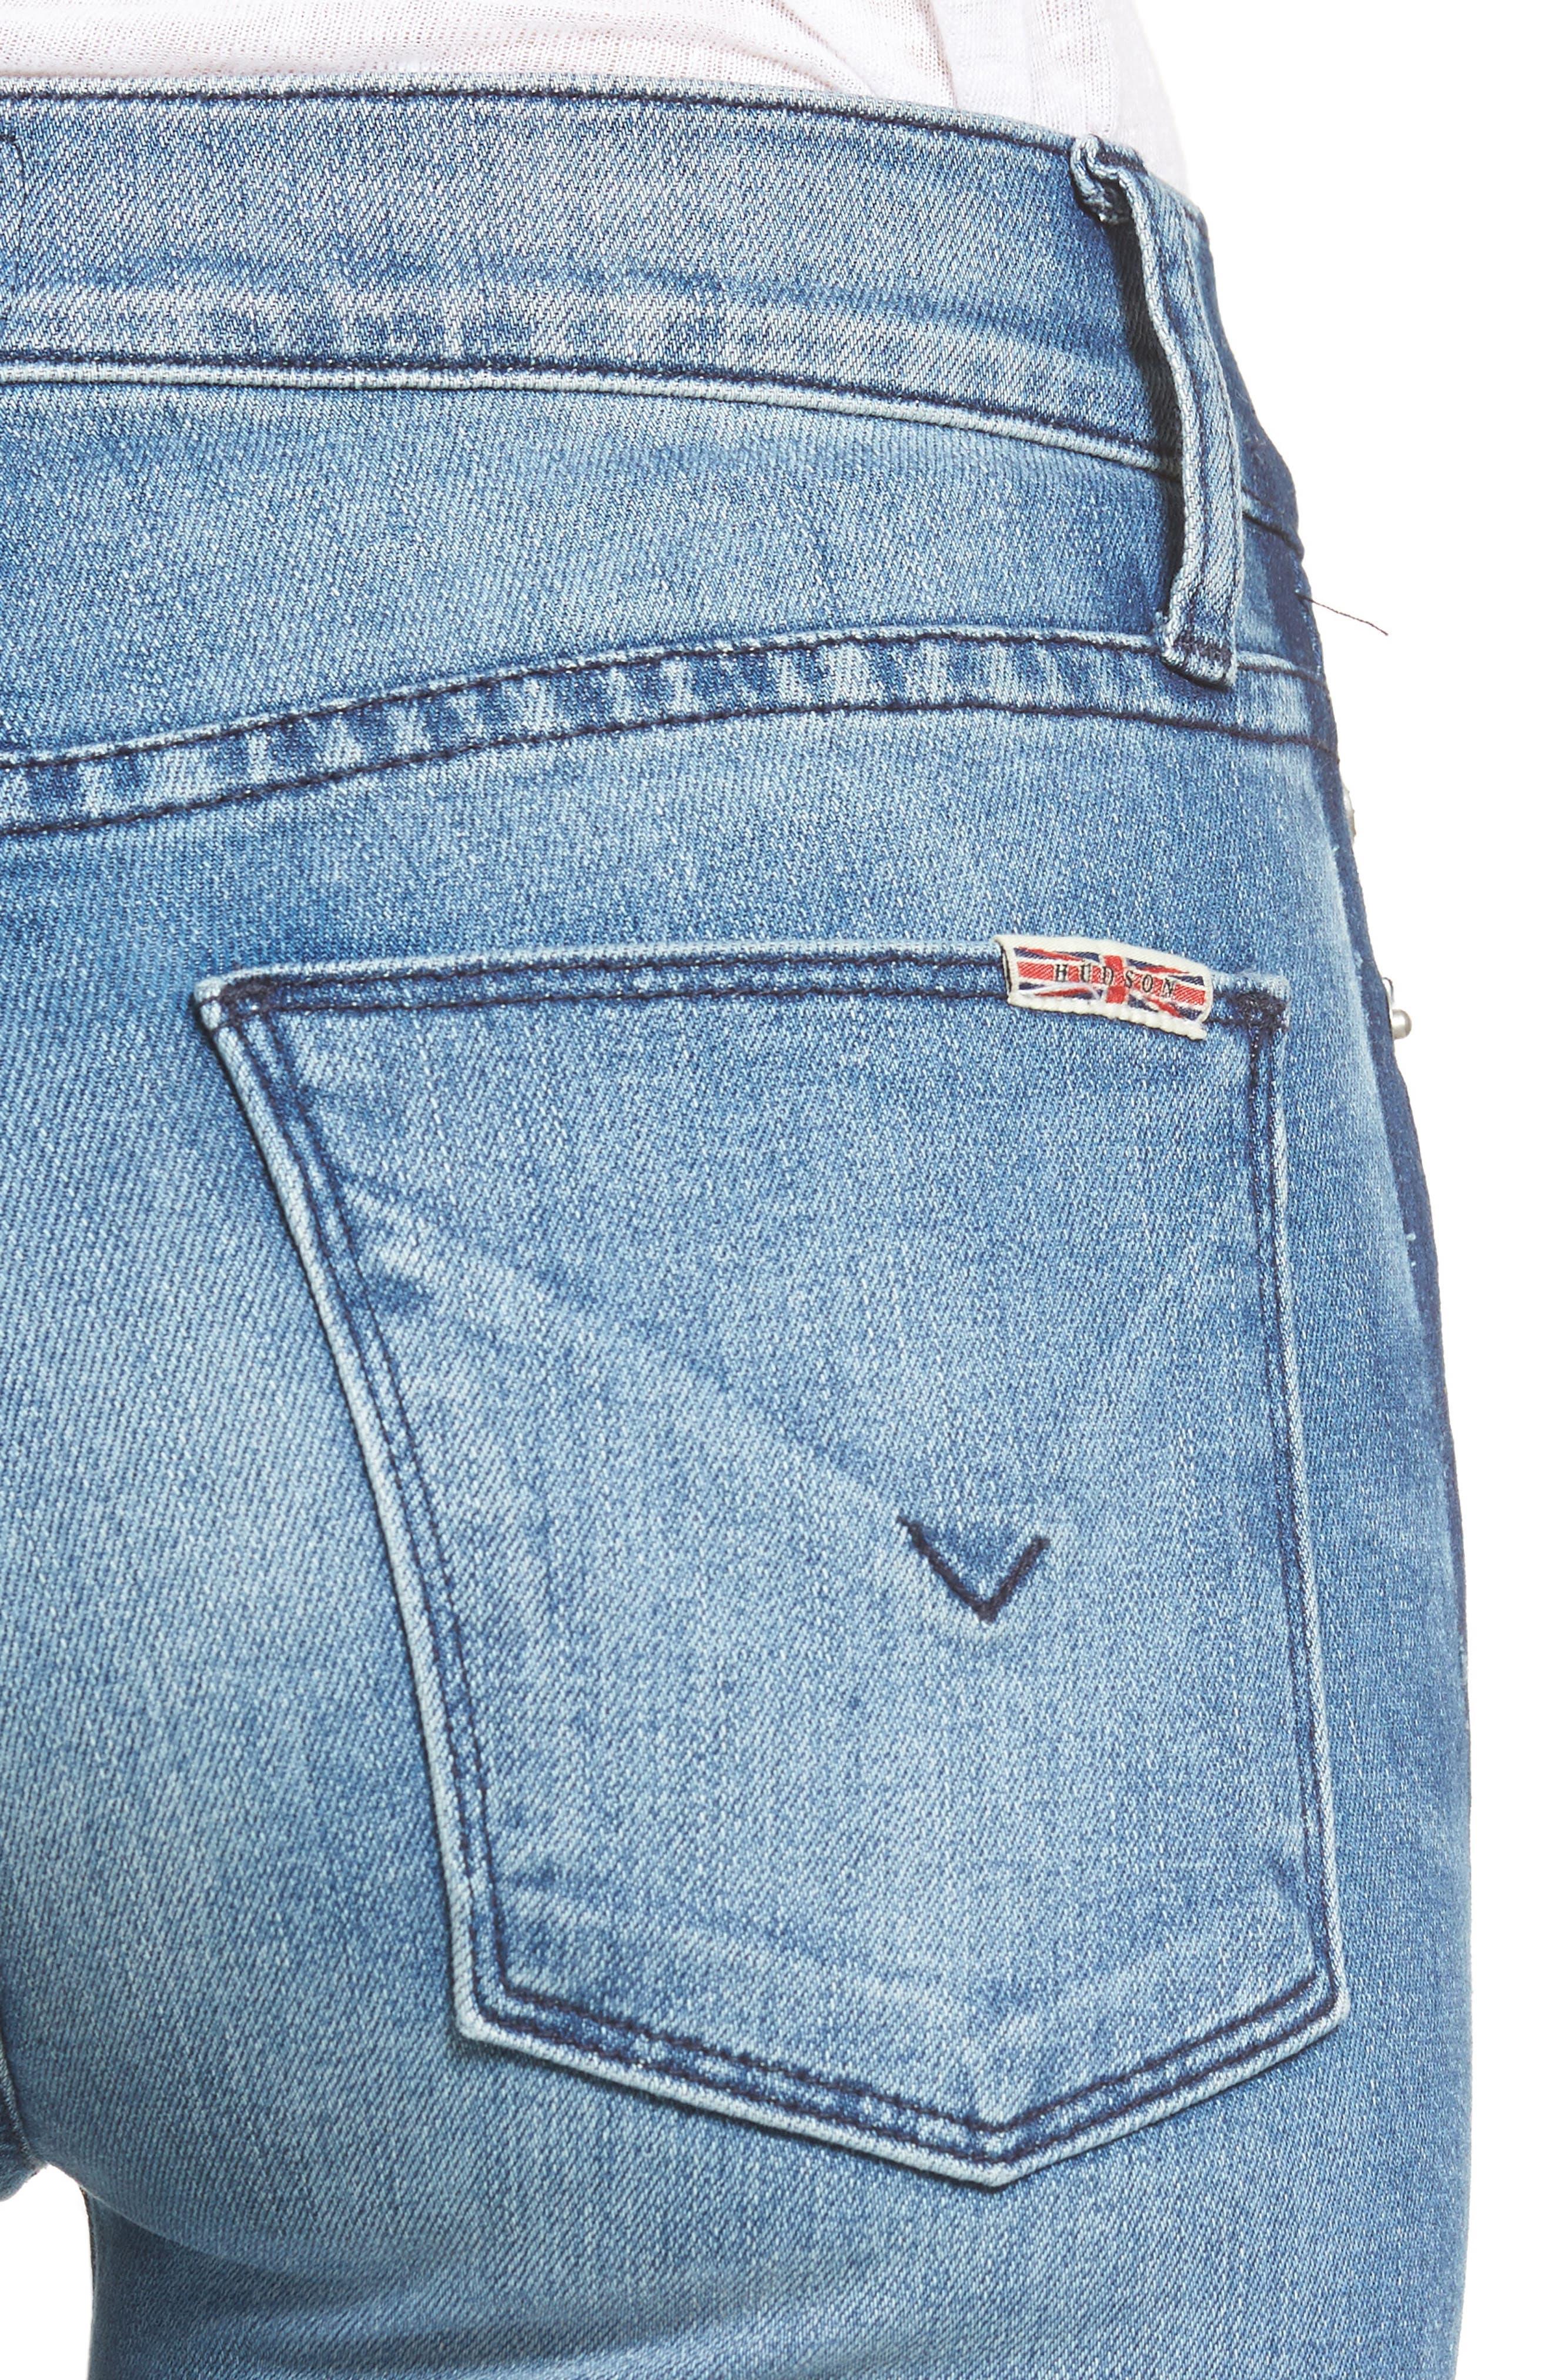 Tilda Crop Straight Leg Jeans,                             Alternate thumbnail 4, color,                             425